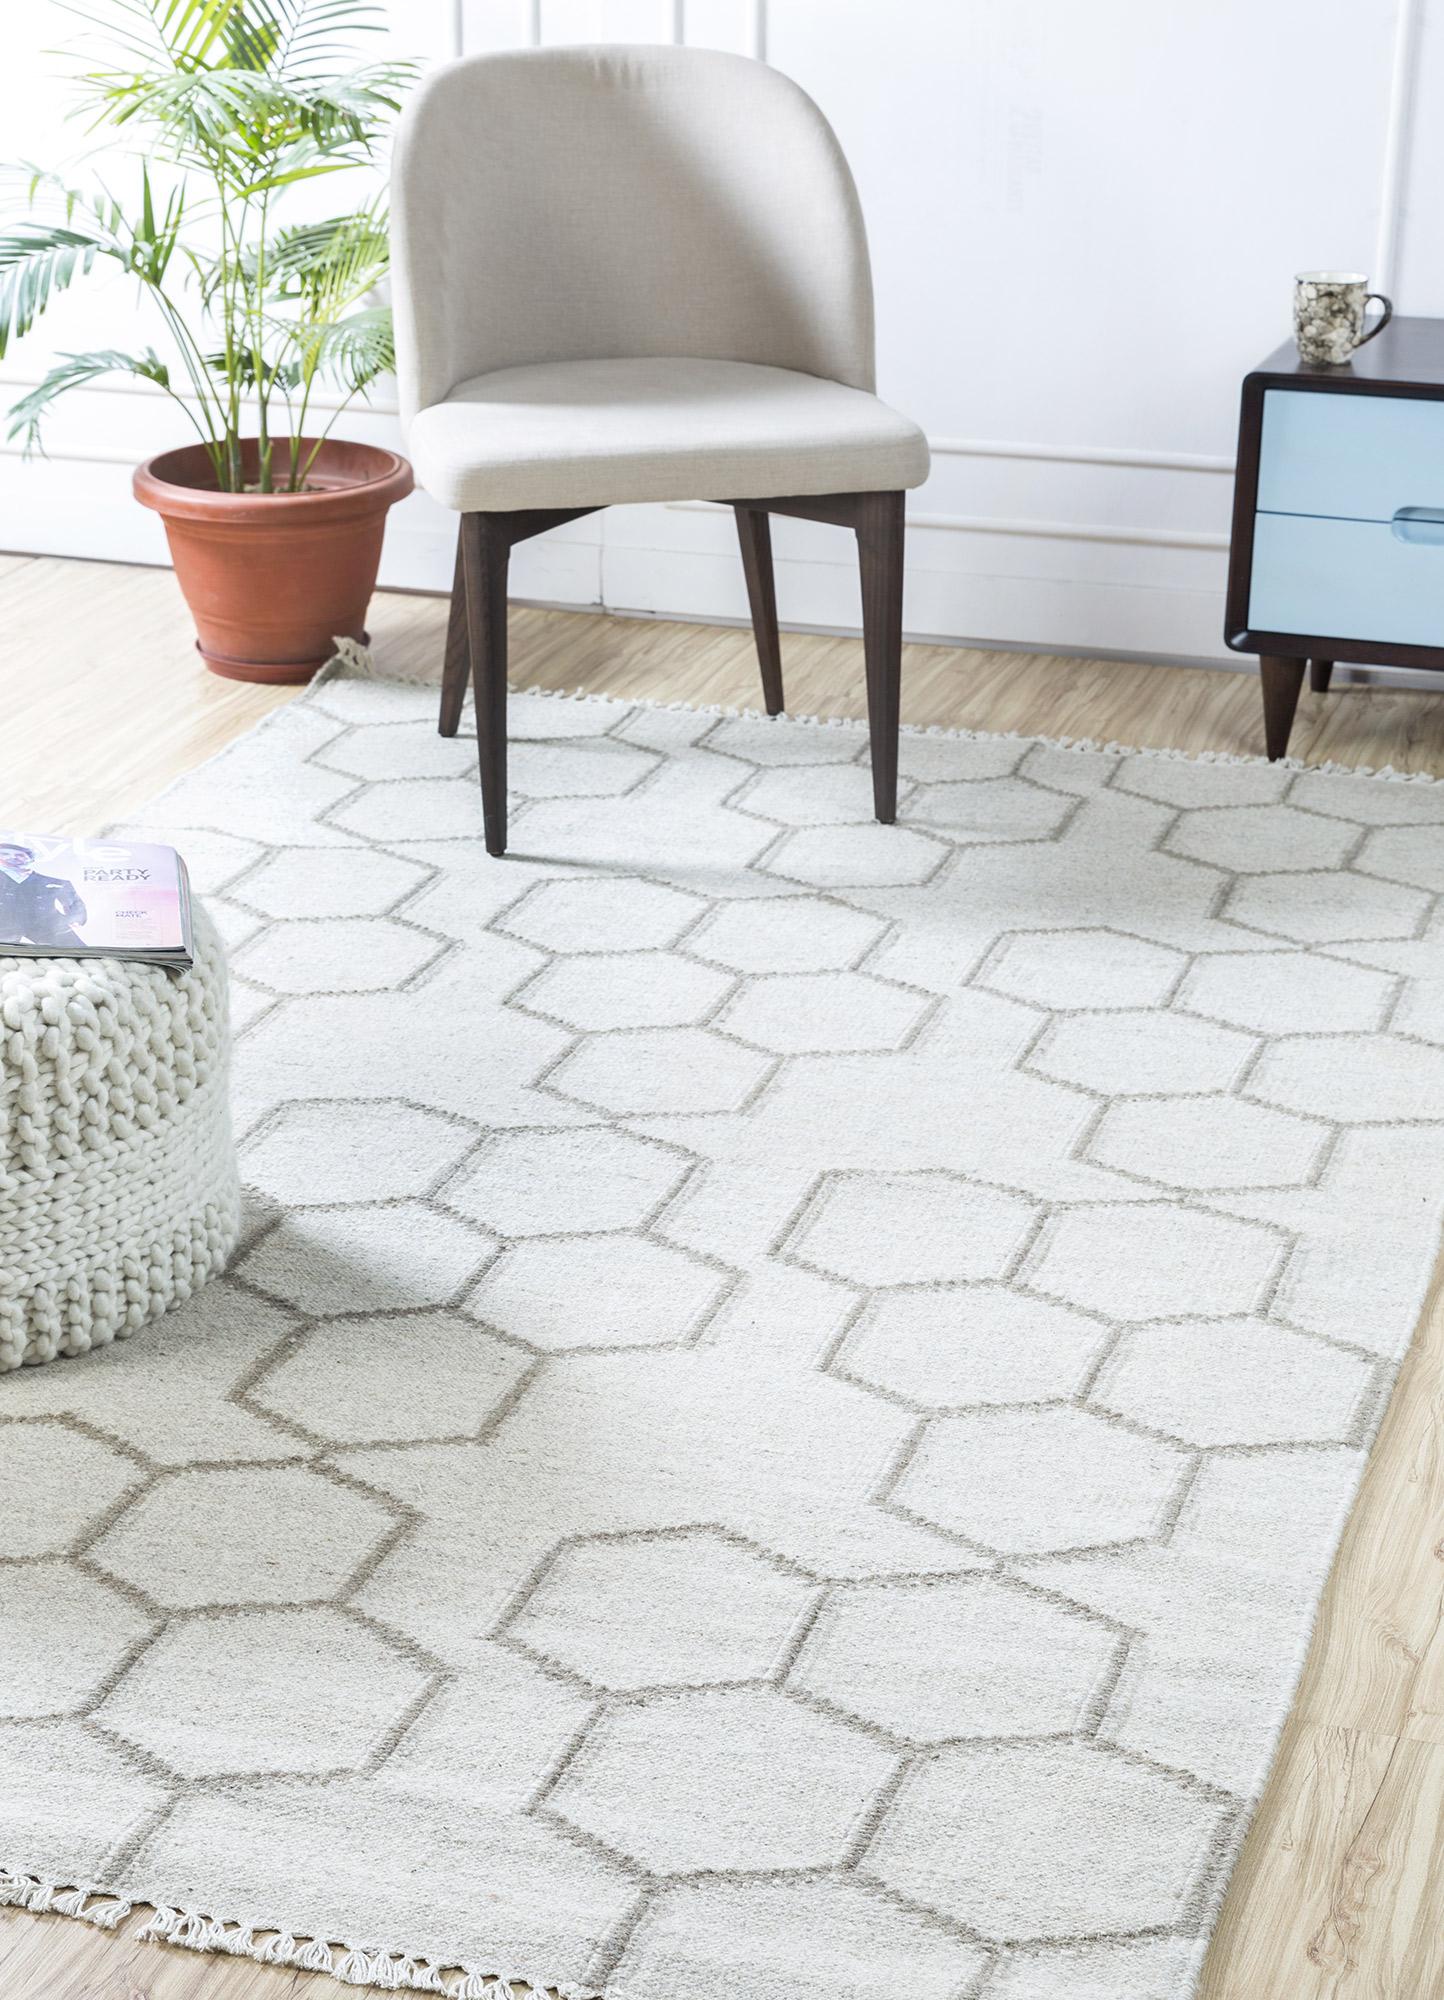 anatolia beige and brown wool flat weaves Rug - RoomScene